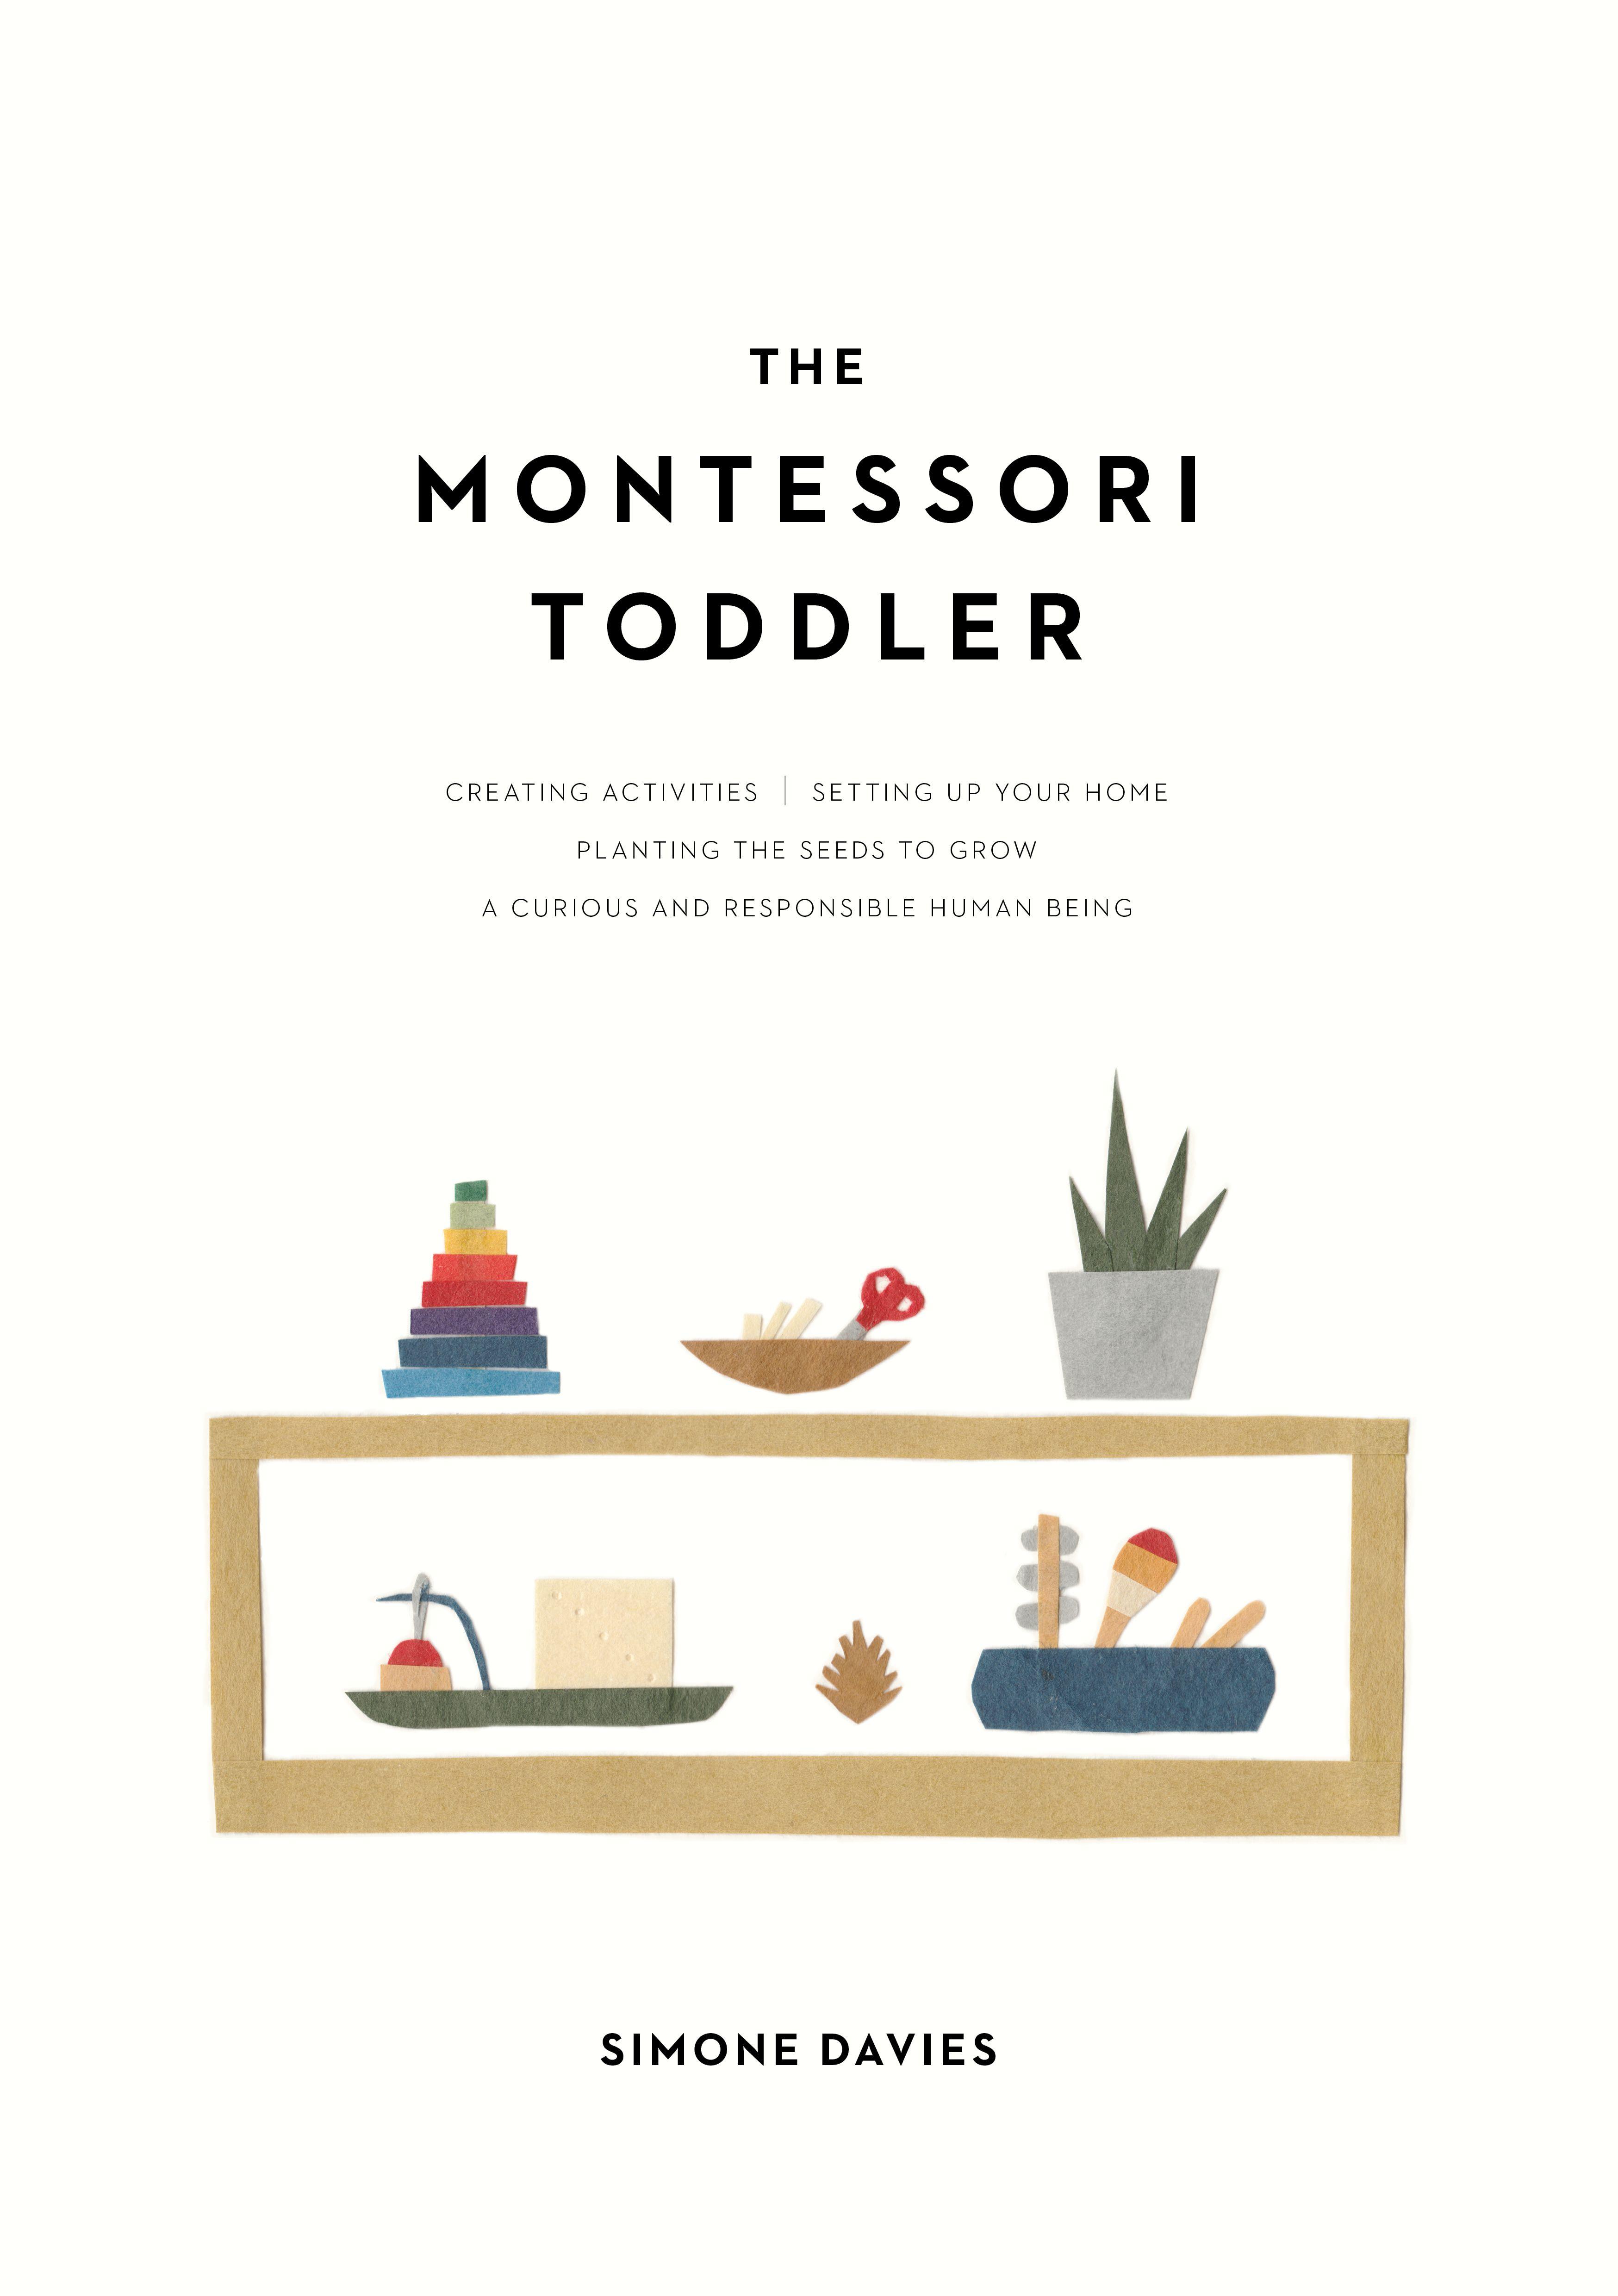 Why Choose Montessori for My Child